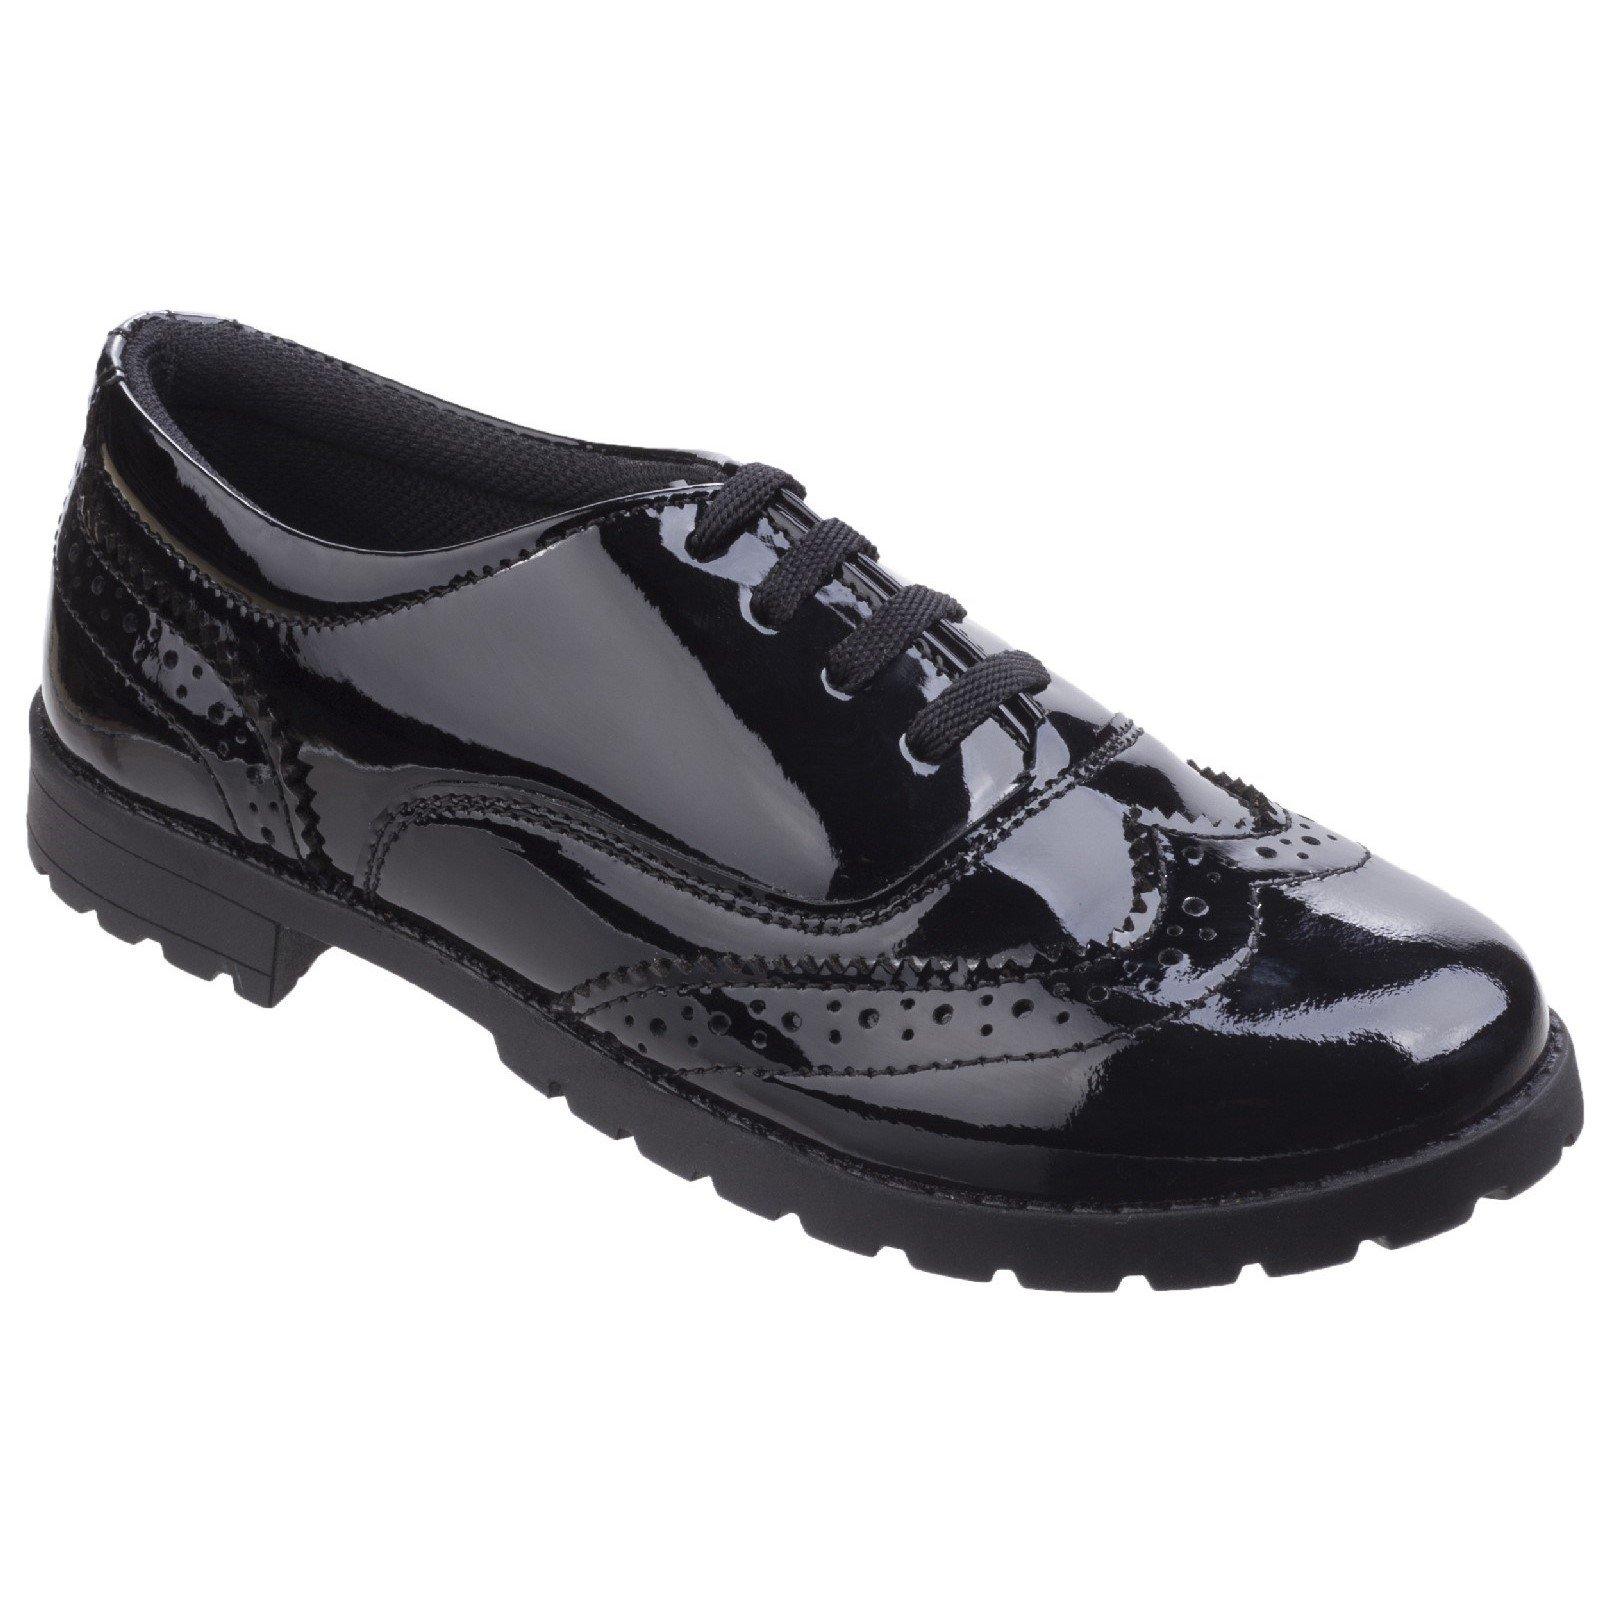 Hush Puppies Kid's Eadie Senior Patent School Shoe Black 32735 - Patent Black 4